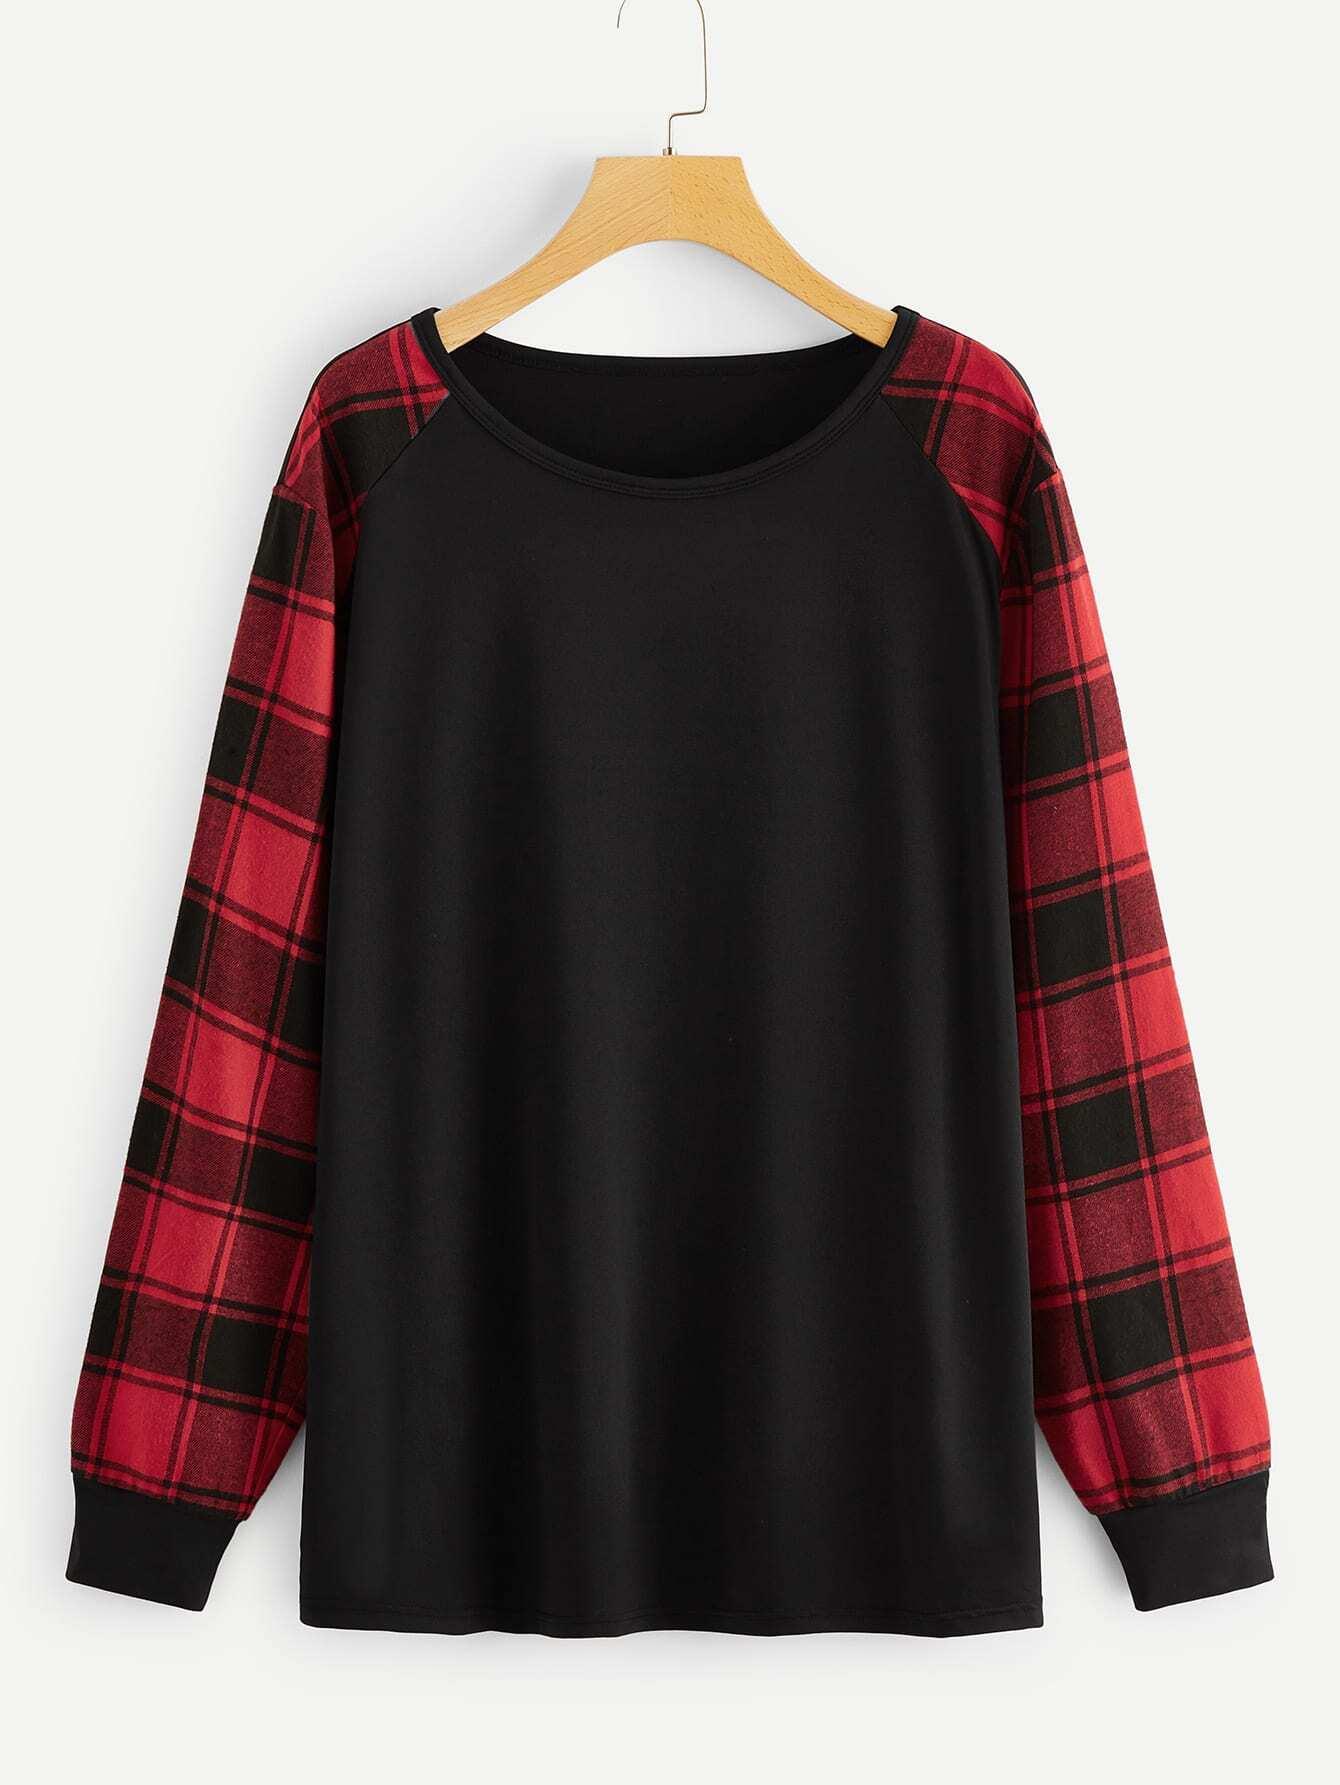 Купить Размер плюс футболка с клетчатым рукавом, null, SheIn